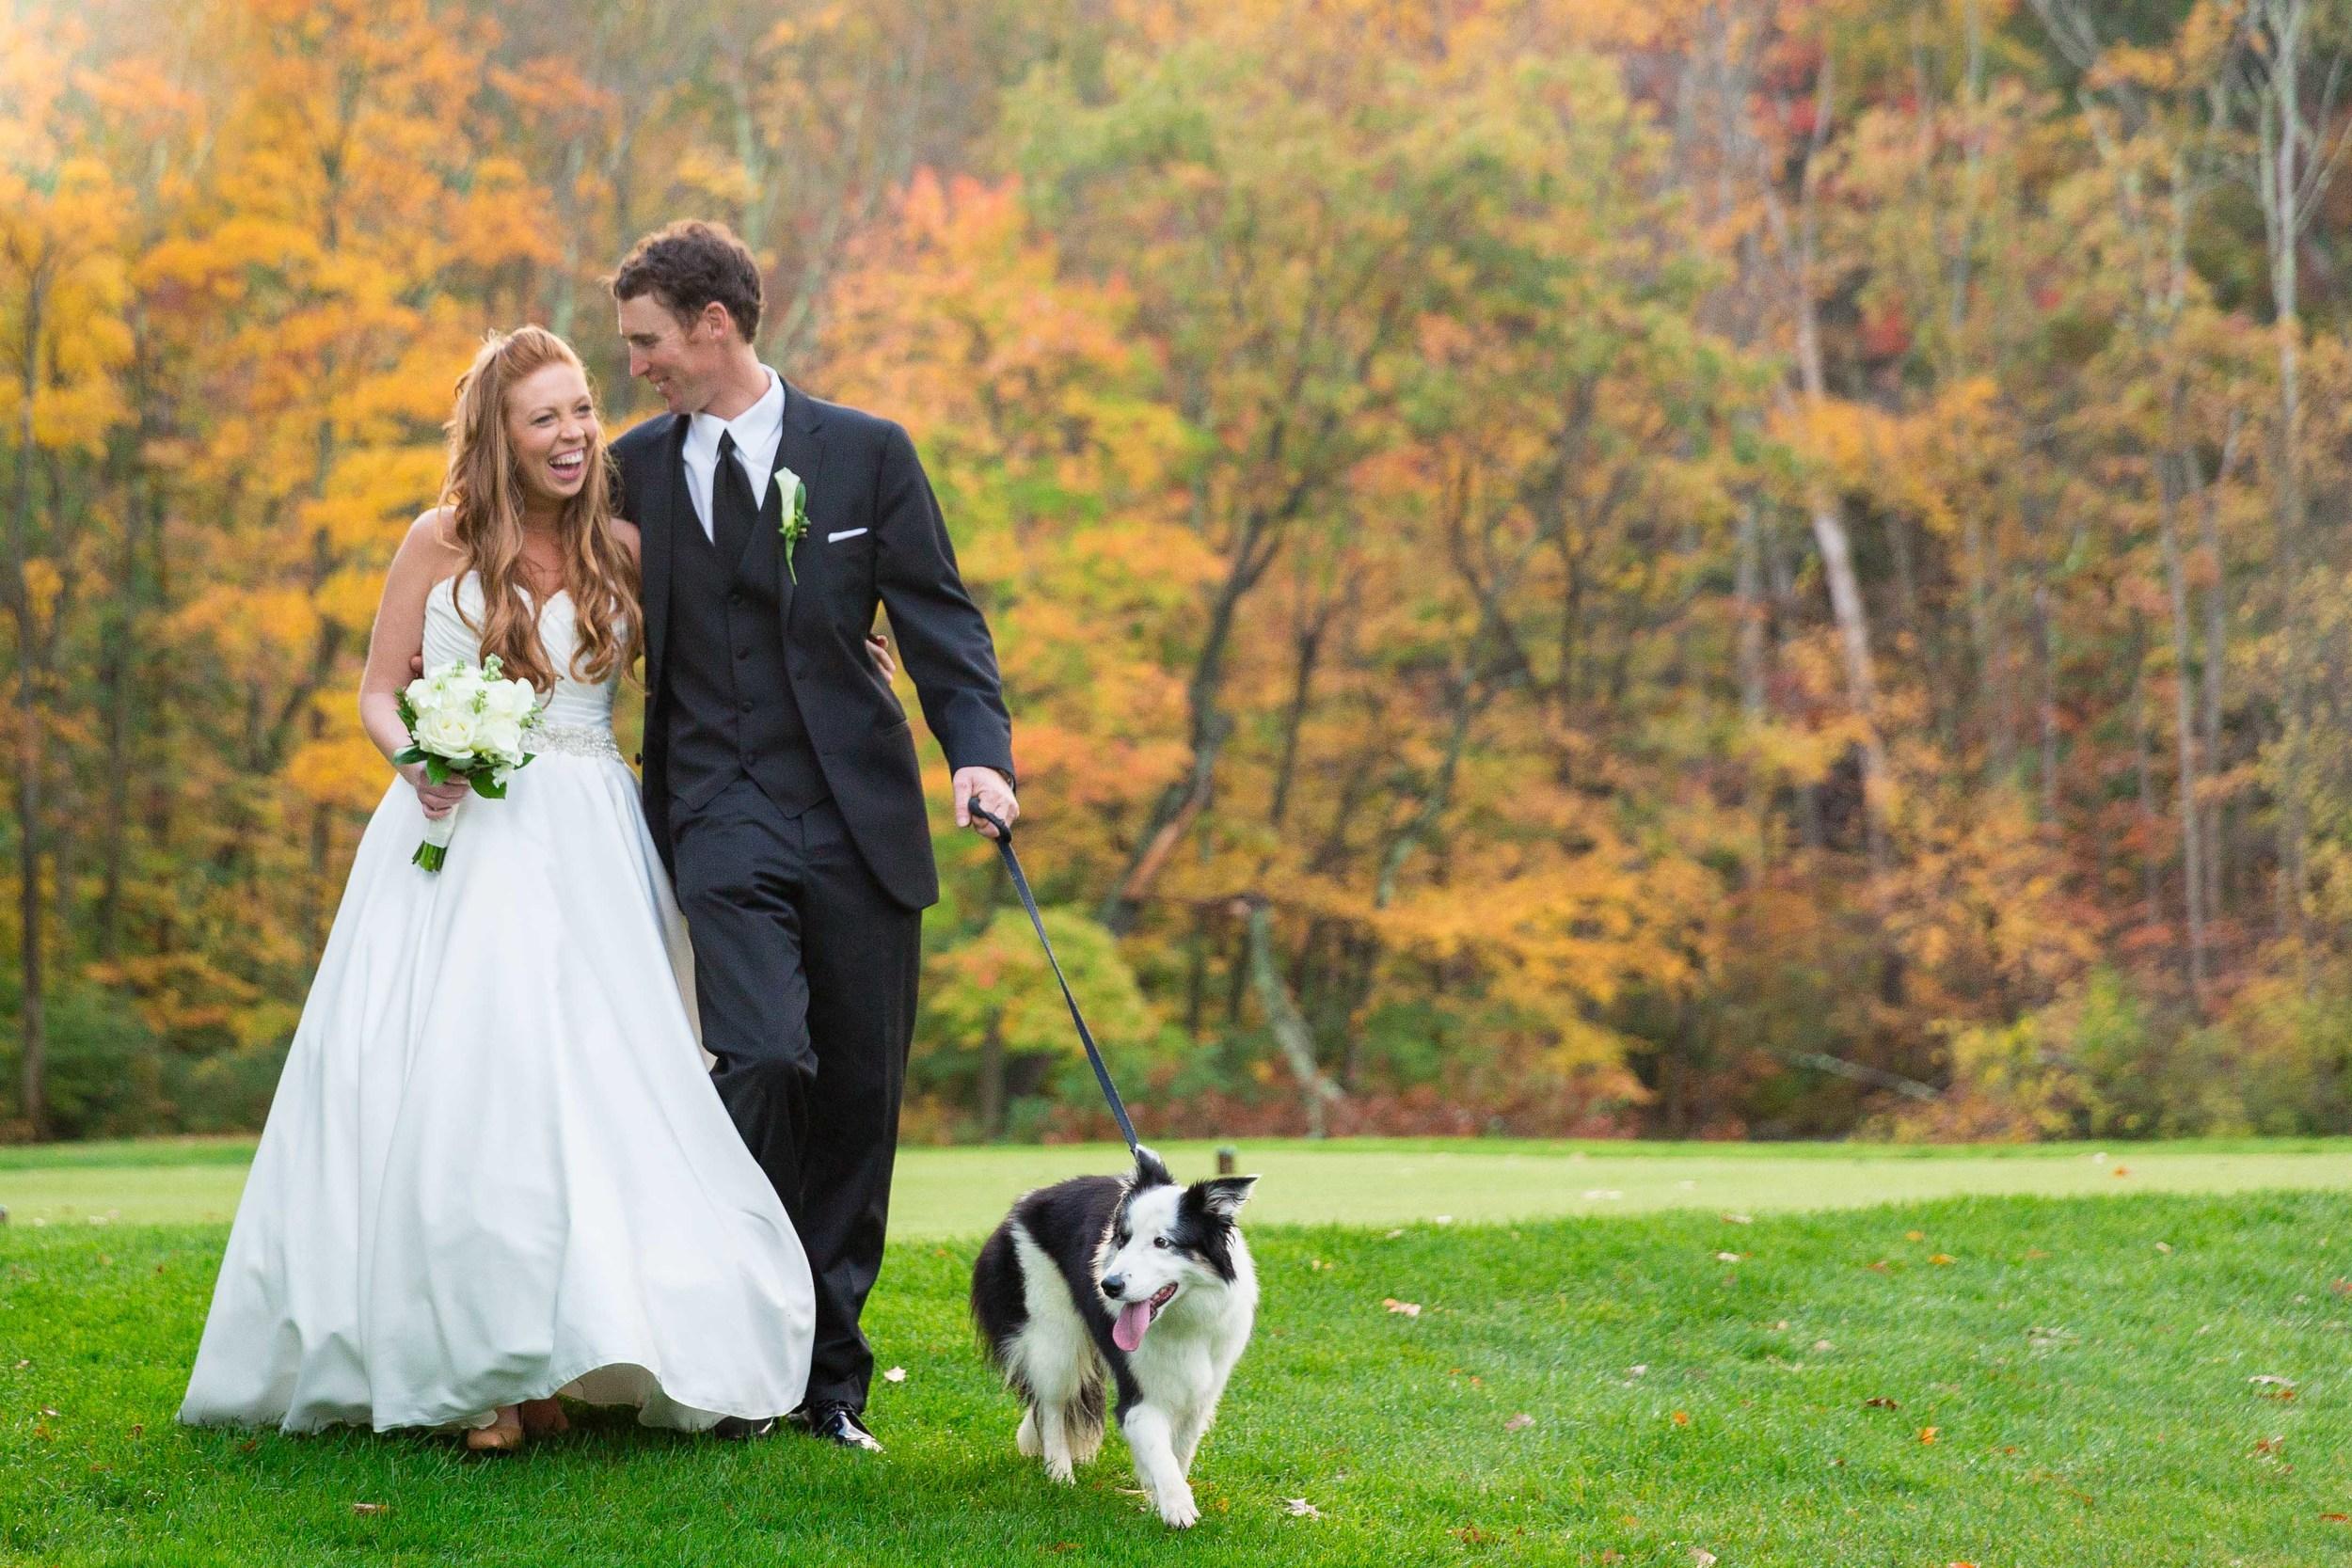 Connecticut-Fall-Wedding-Shuttle-Meadow-Country-Club-CT-Documentary-Wedding-Photographer-Jacek-Dolata-12.jpg